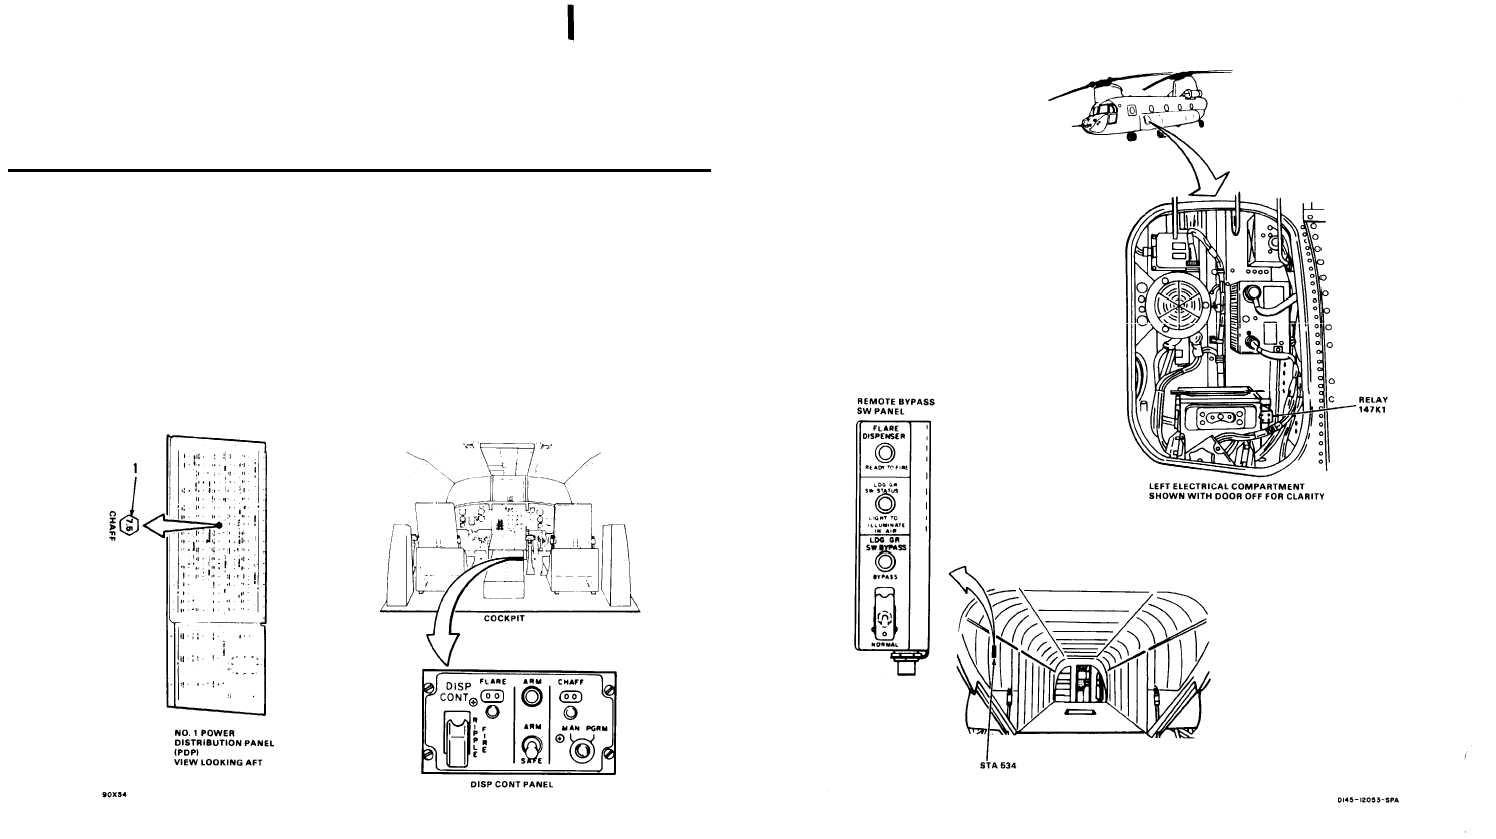 hydraulic press nsn T 240 Heilcopter 1520 55 3 Manual TM